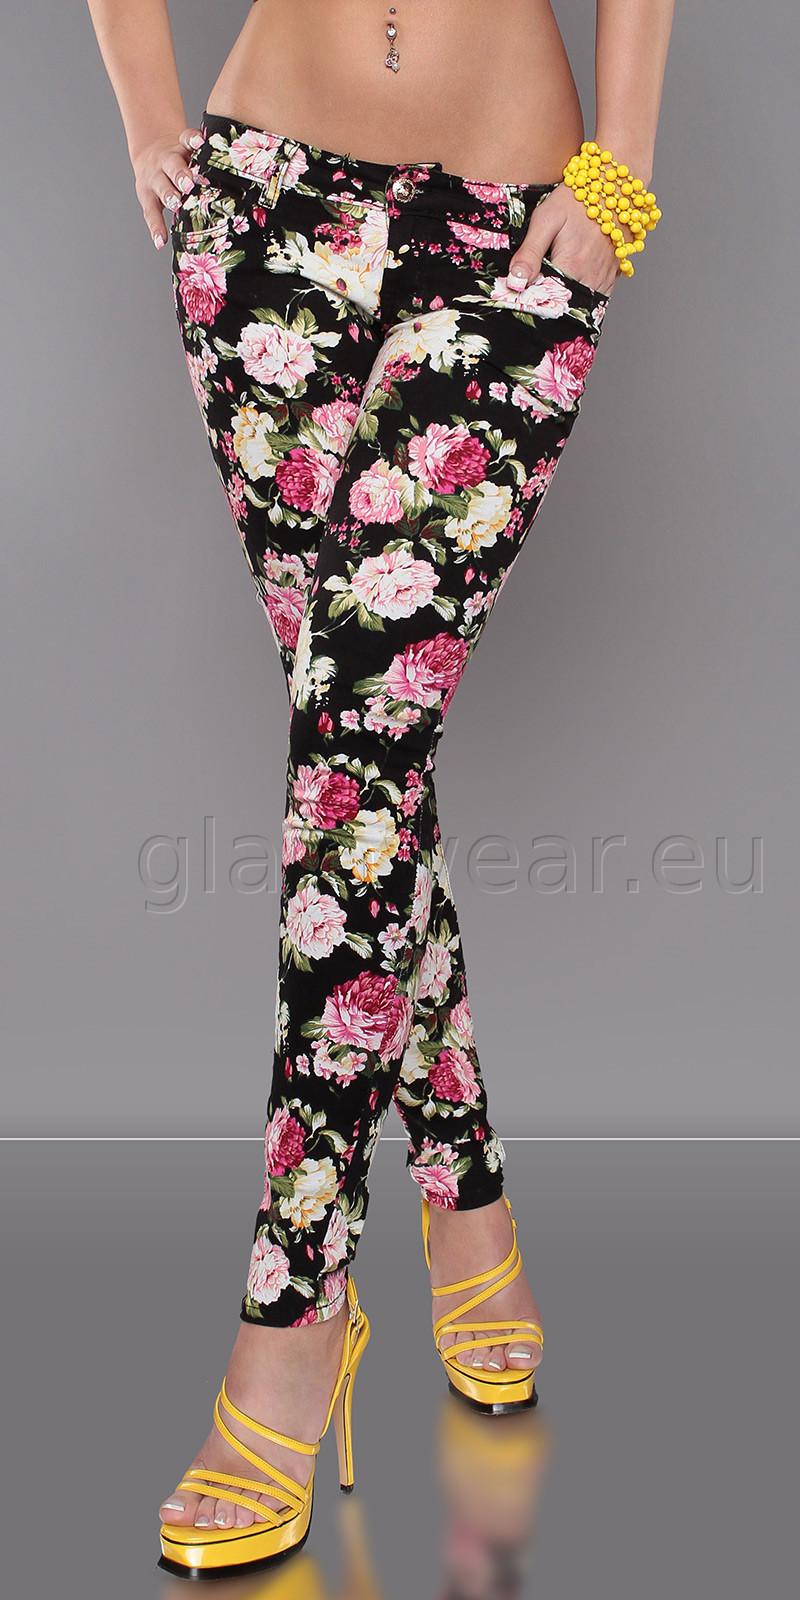 Брюки с цветами женские фото